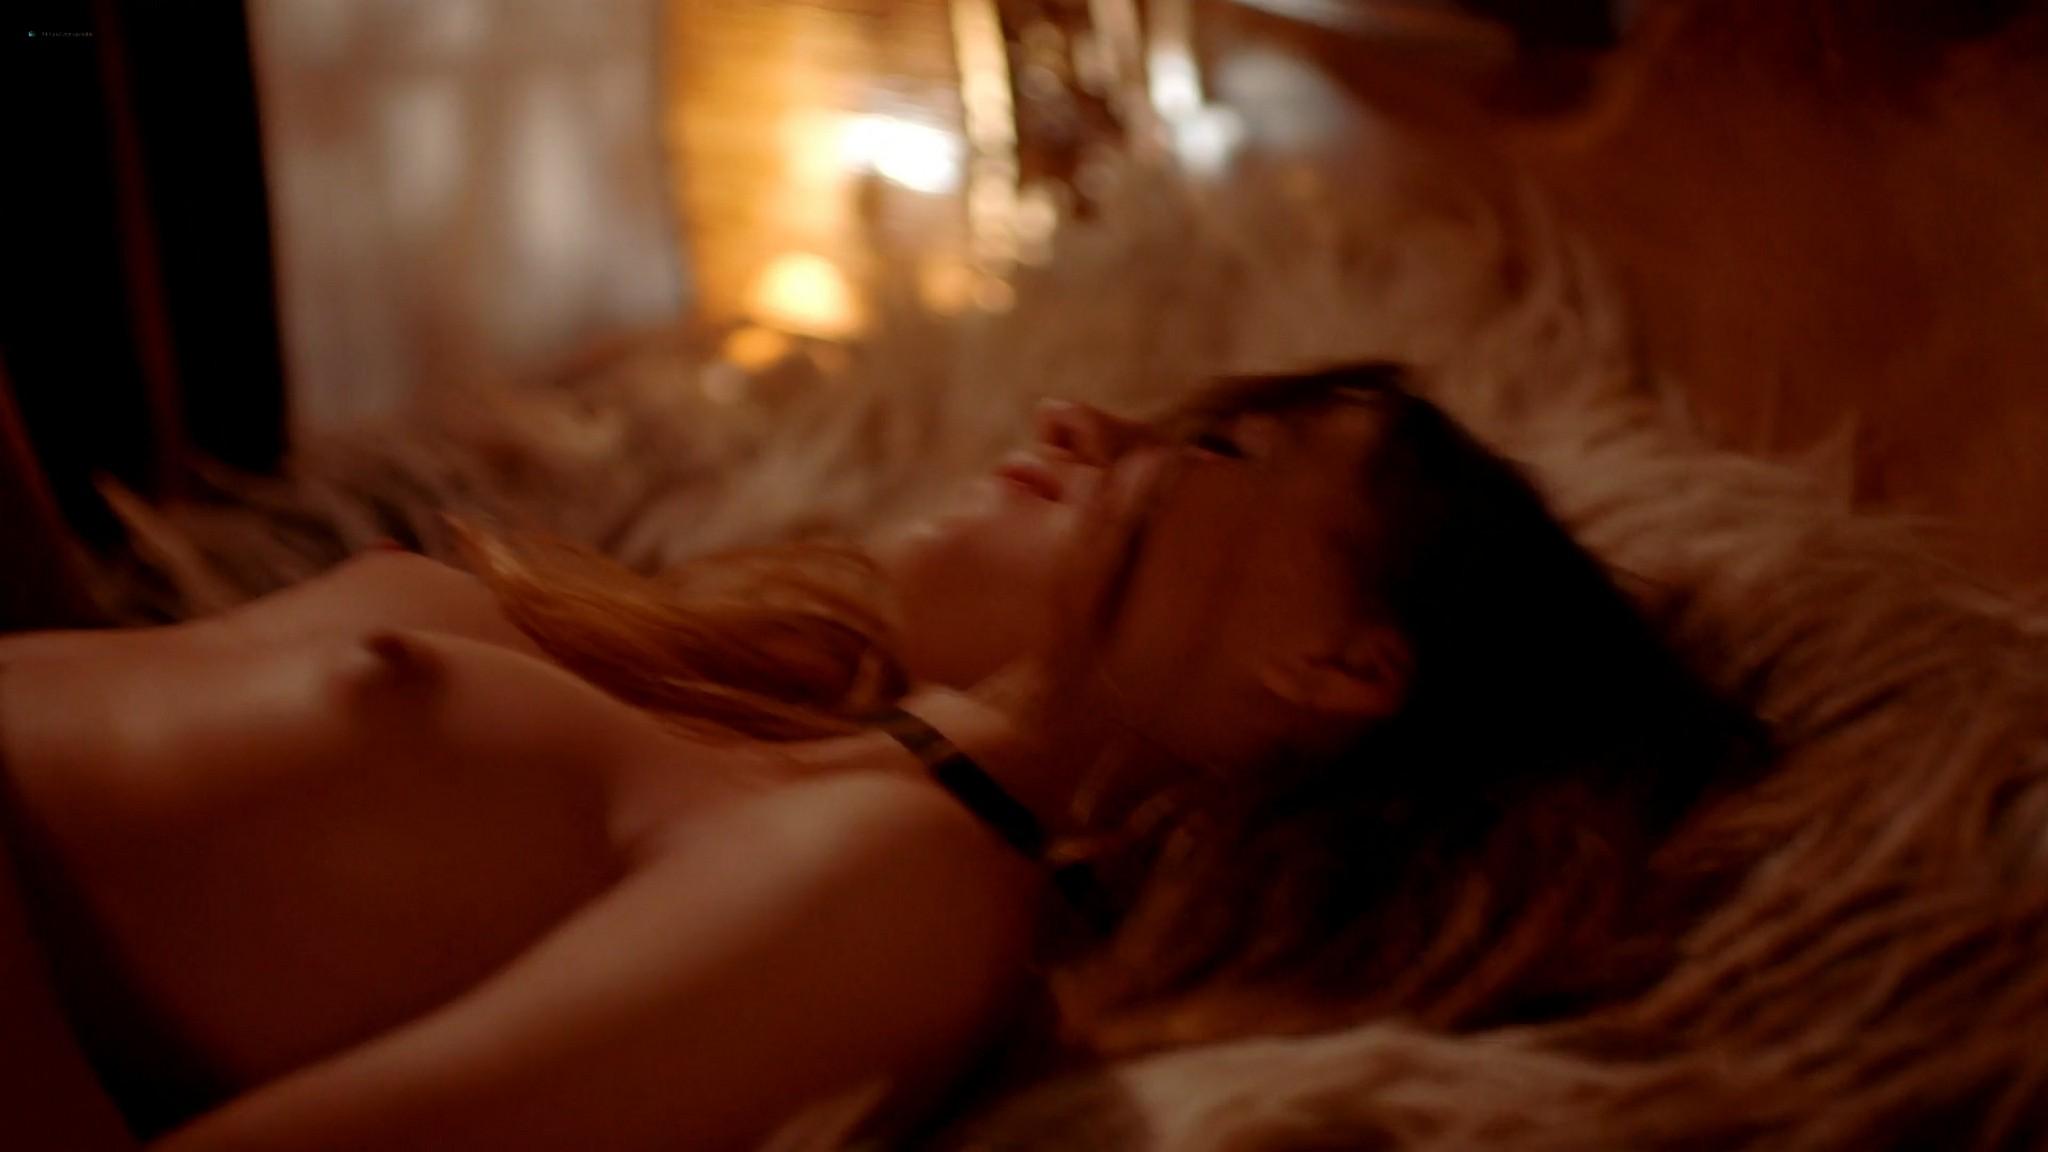 Maria Bakalova nude sex Yoanna Izabella Varbanova nude sex too Transgression BG 2018 HD 1080p Web 004